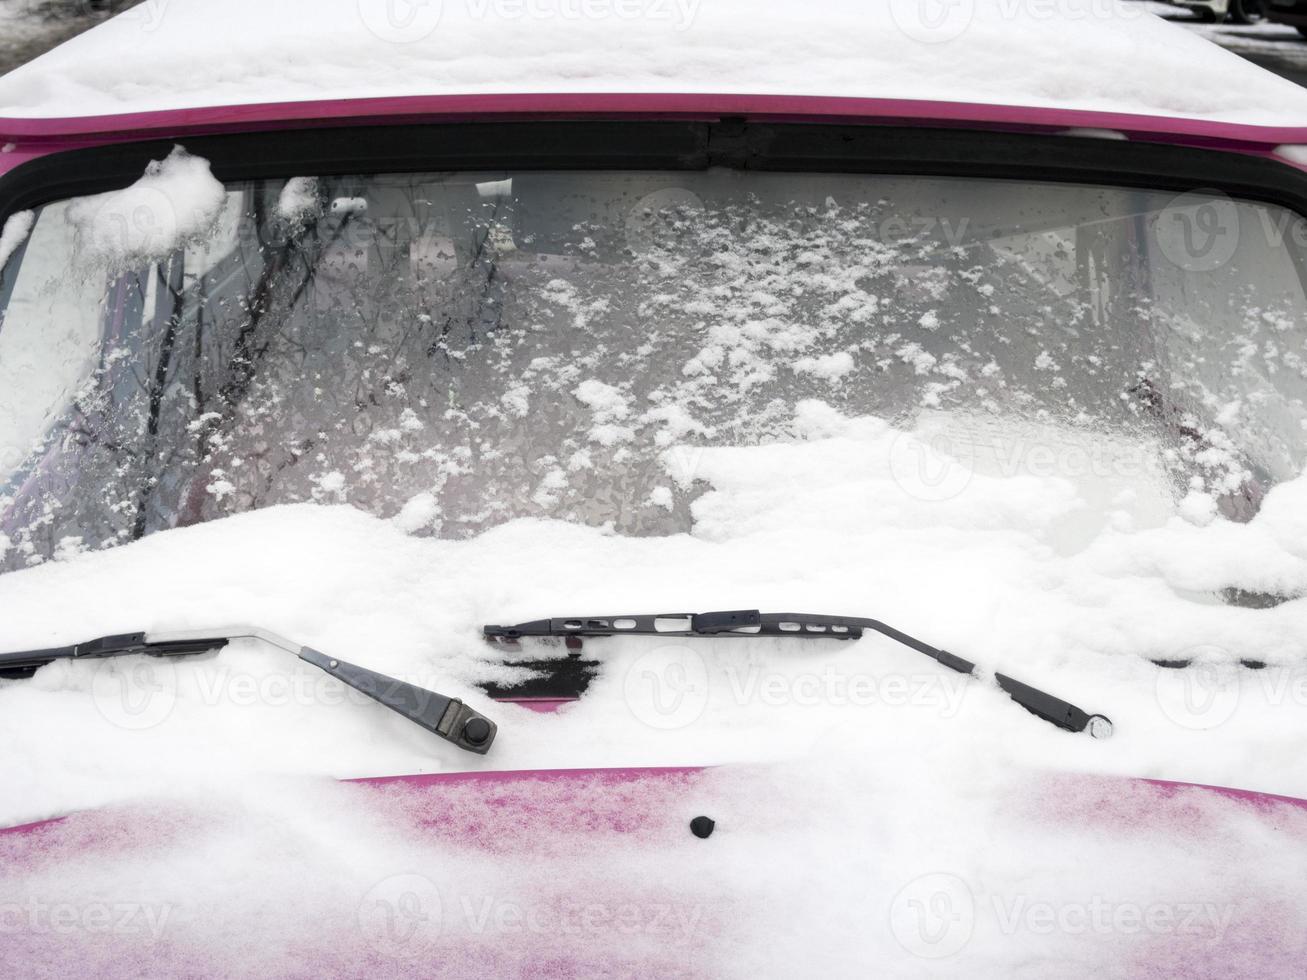 vinterbil foto